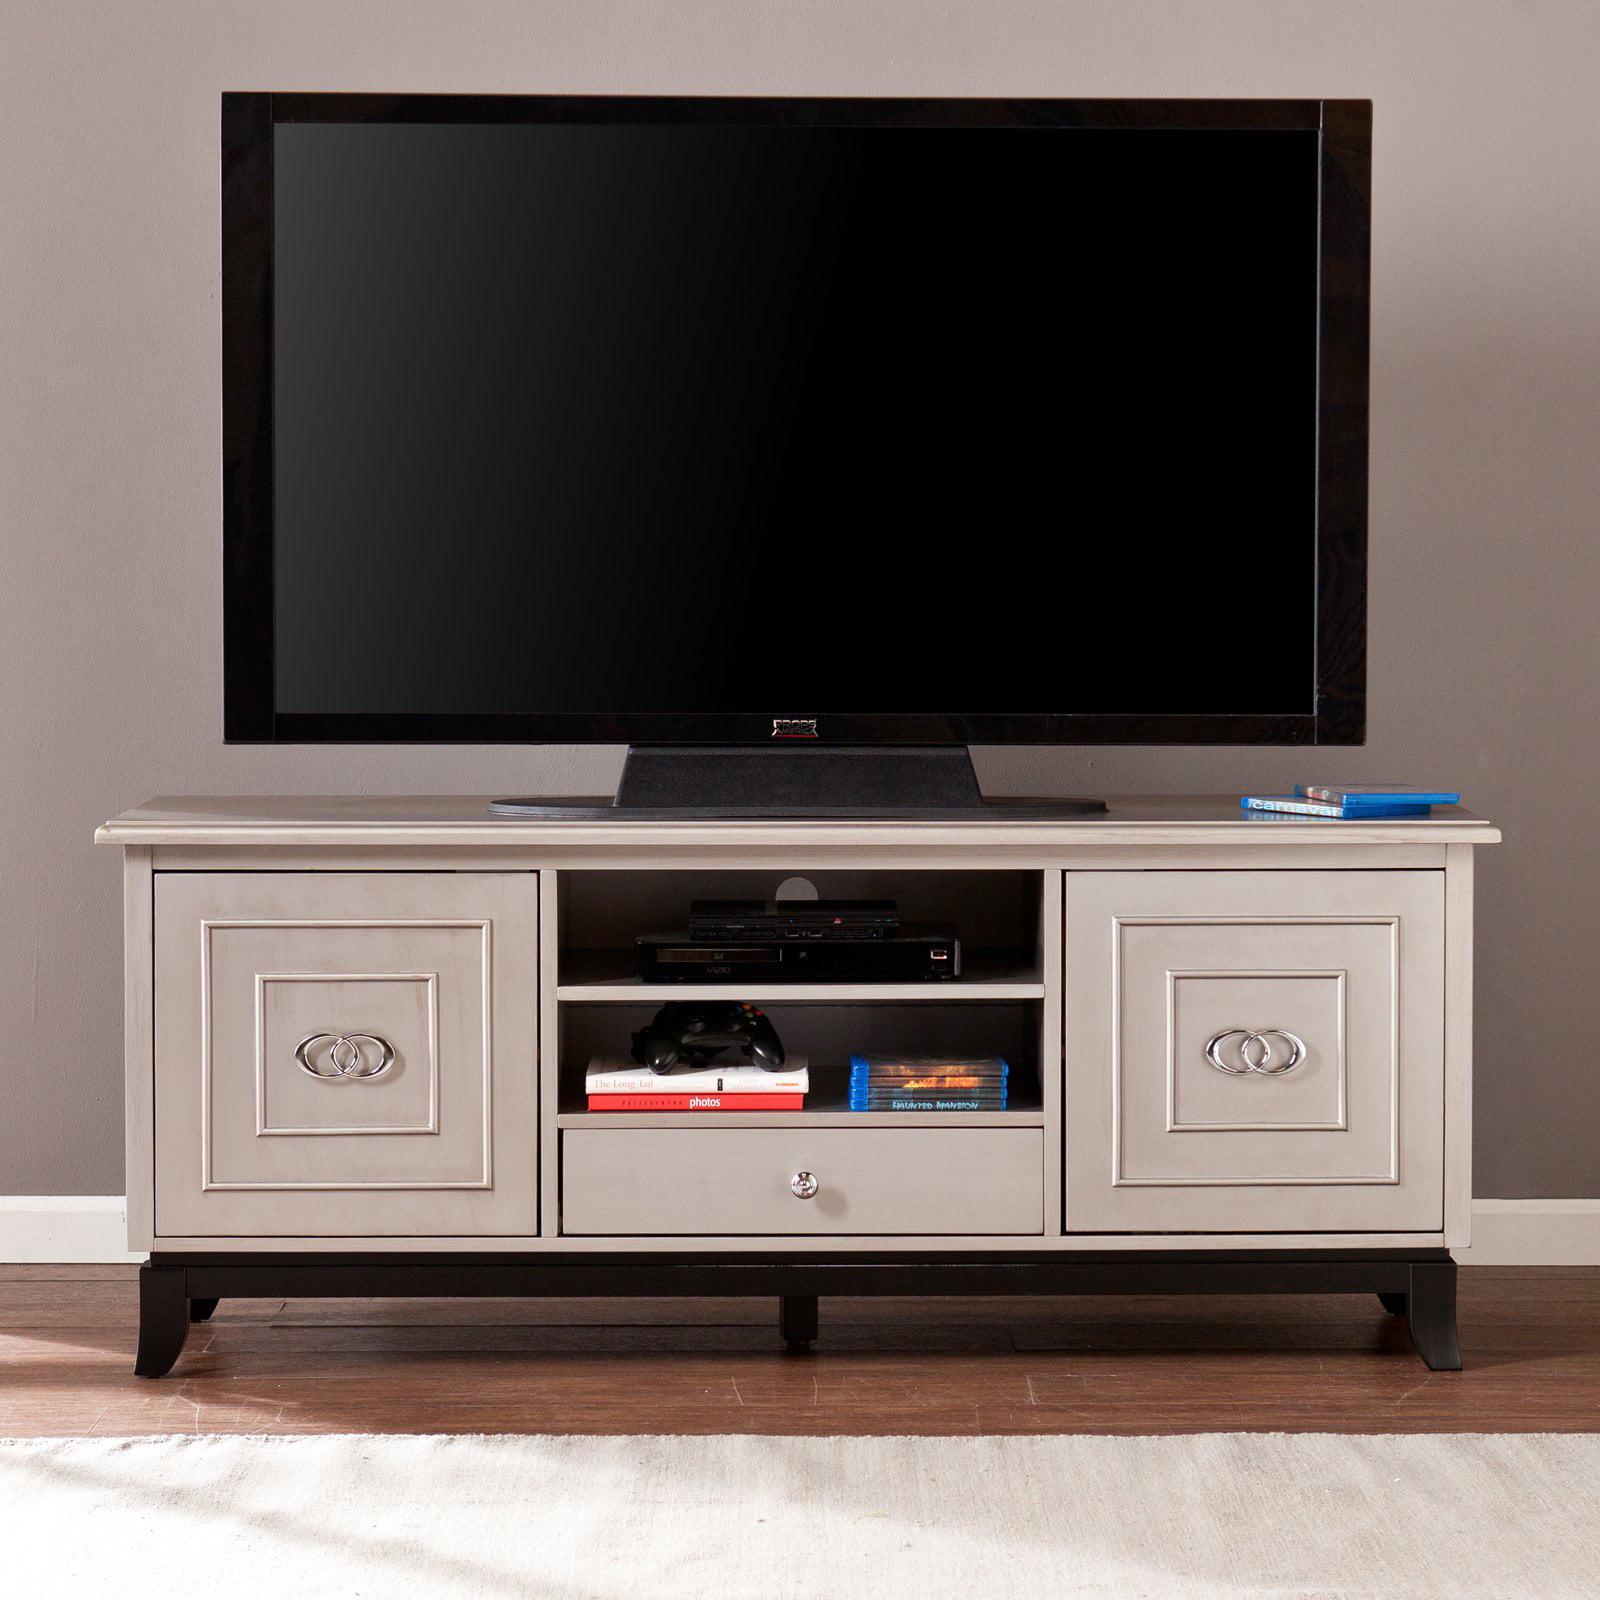 Southern Enterprises Wildon 60 in. TV   Media Stand Antique Gray by Southern Enterprises Inc